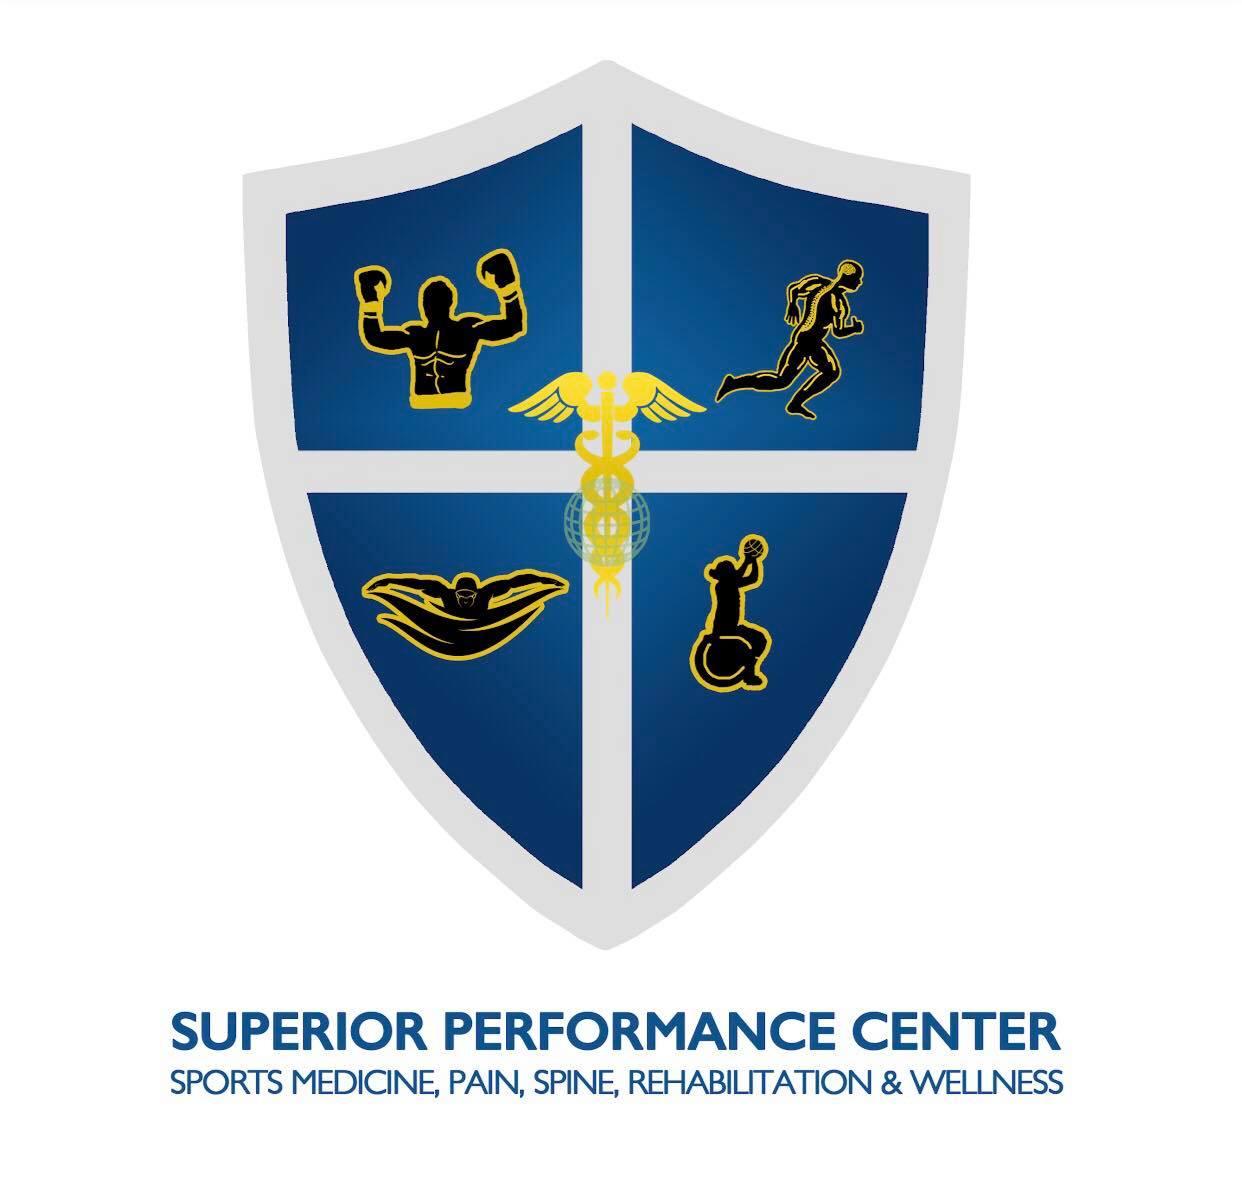 Superior Performance Center